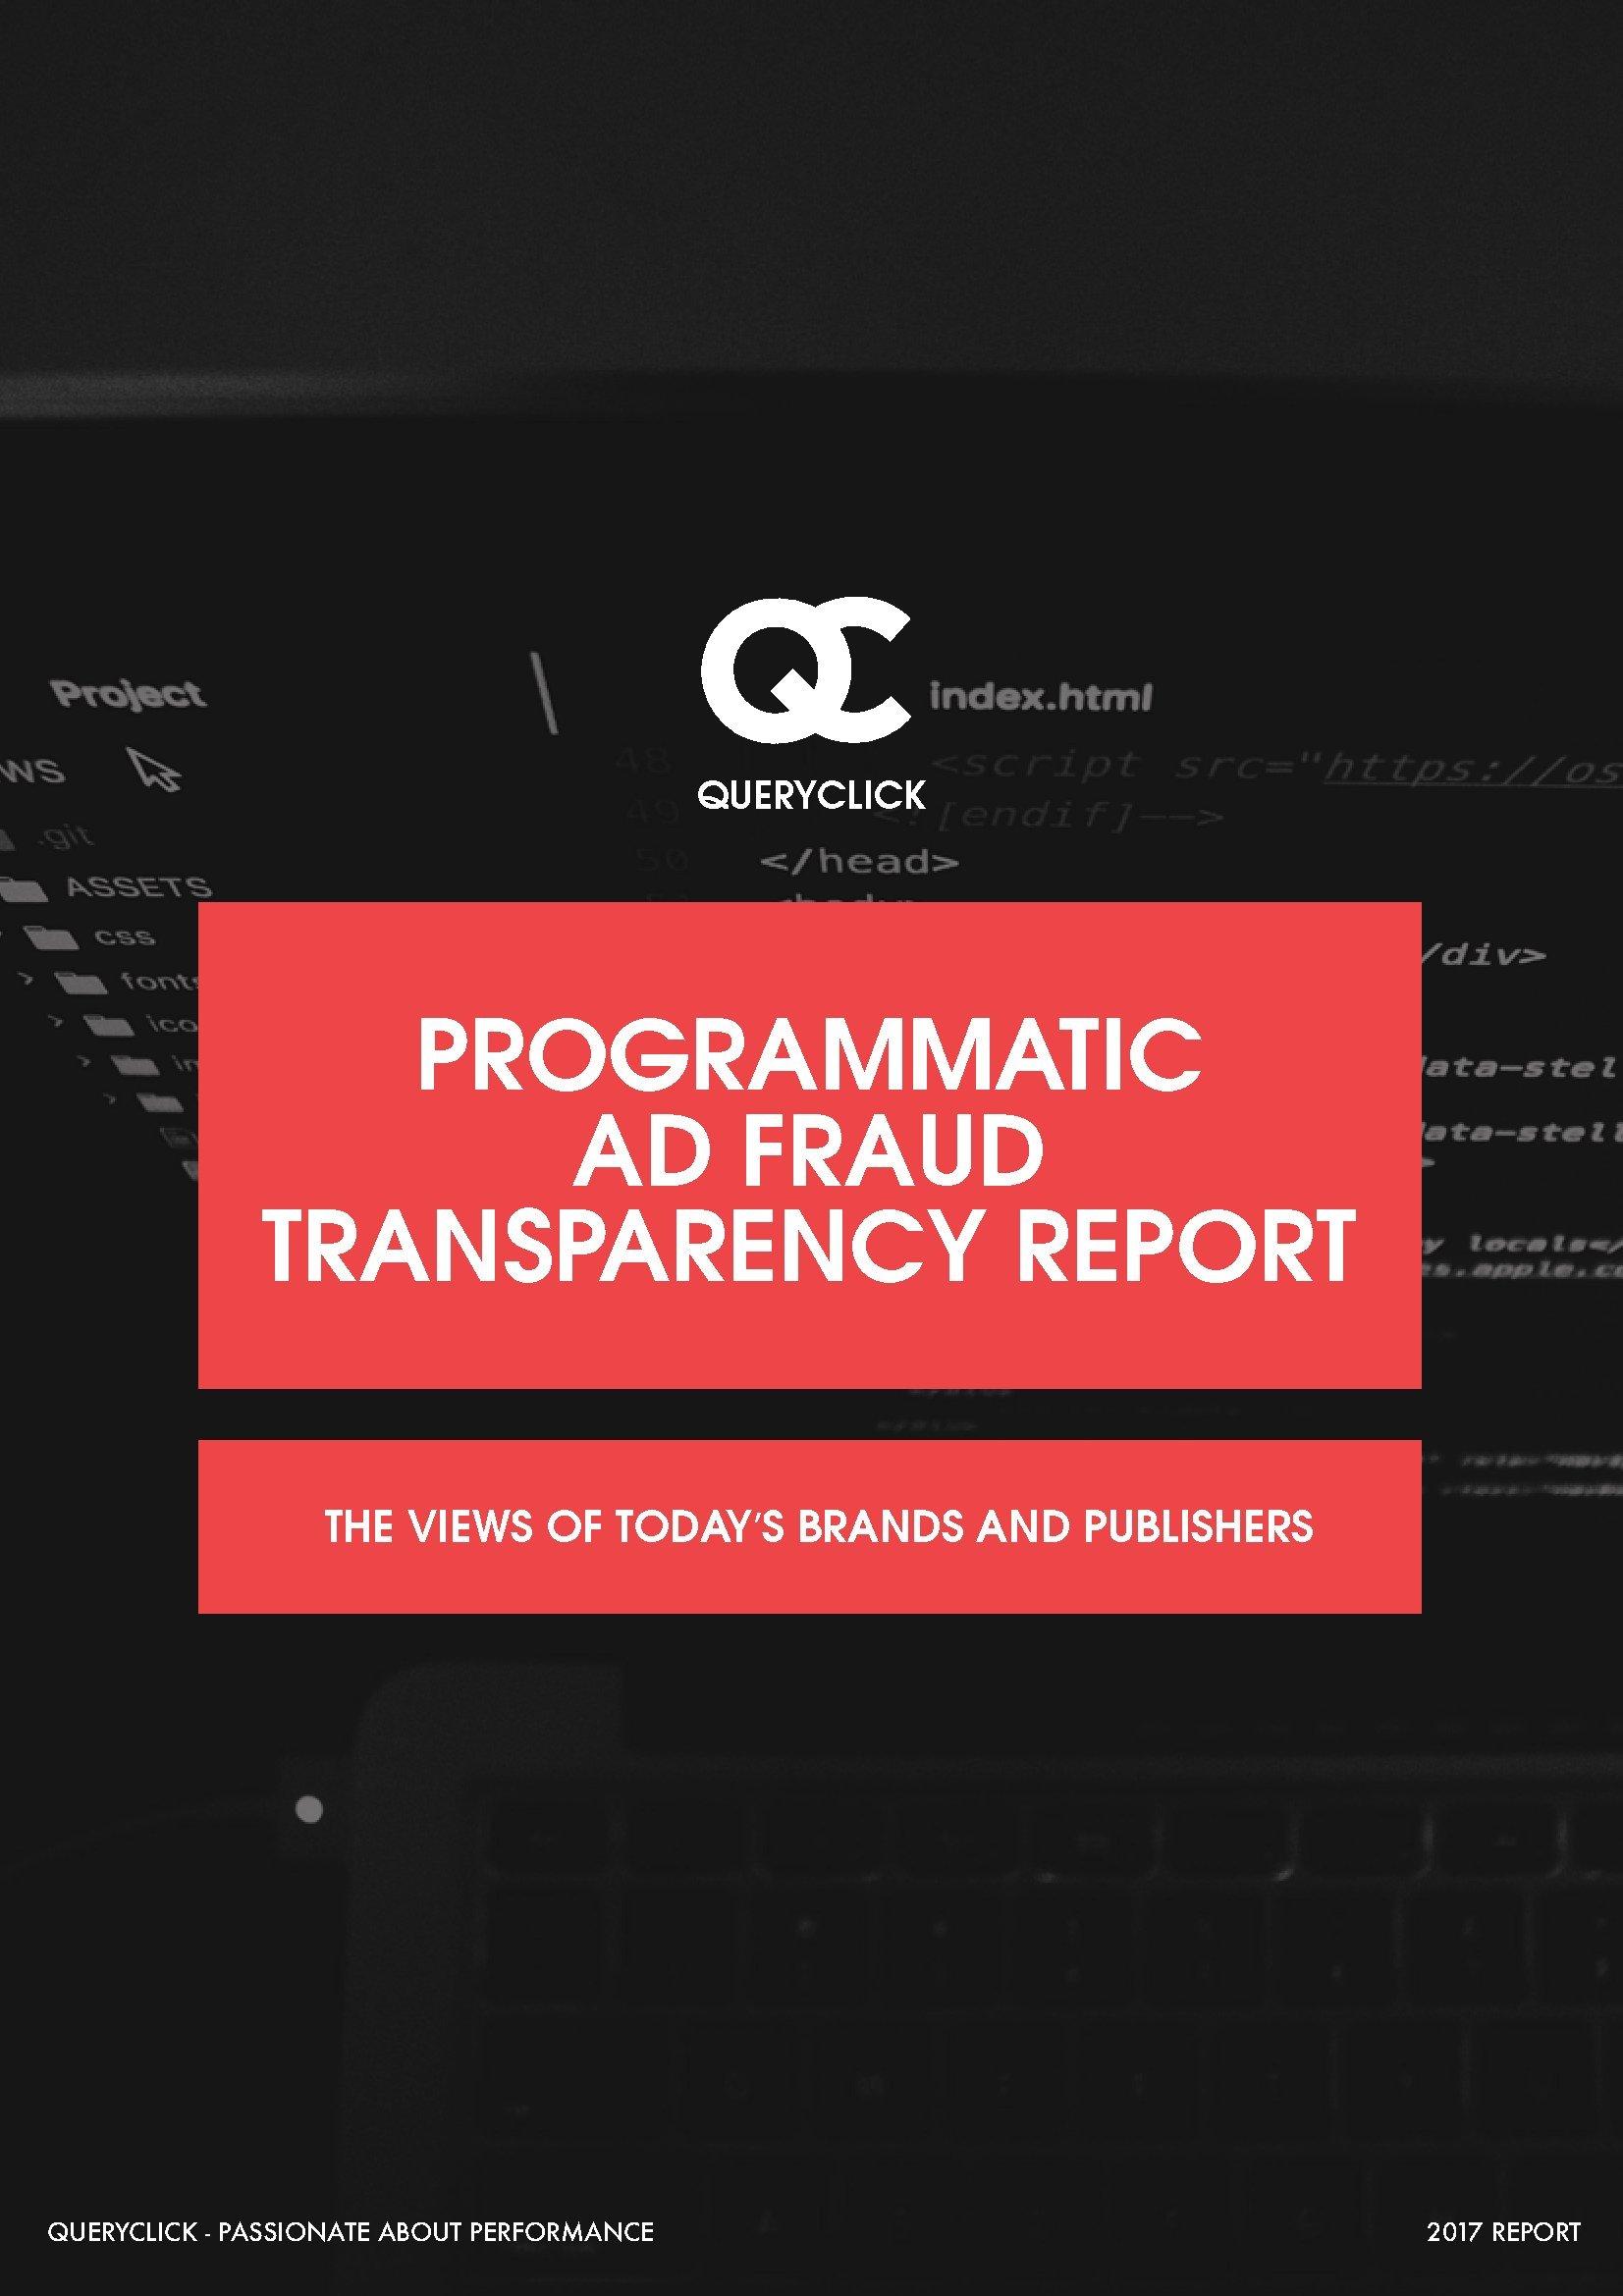 QUERYCLICK:广告程序化购买欺诈透明报告